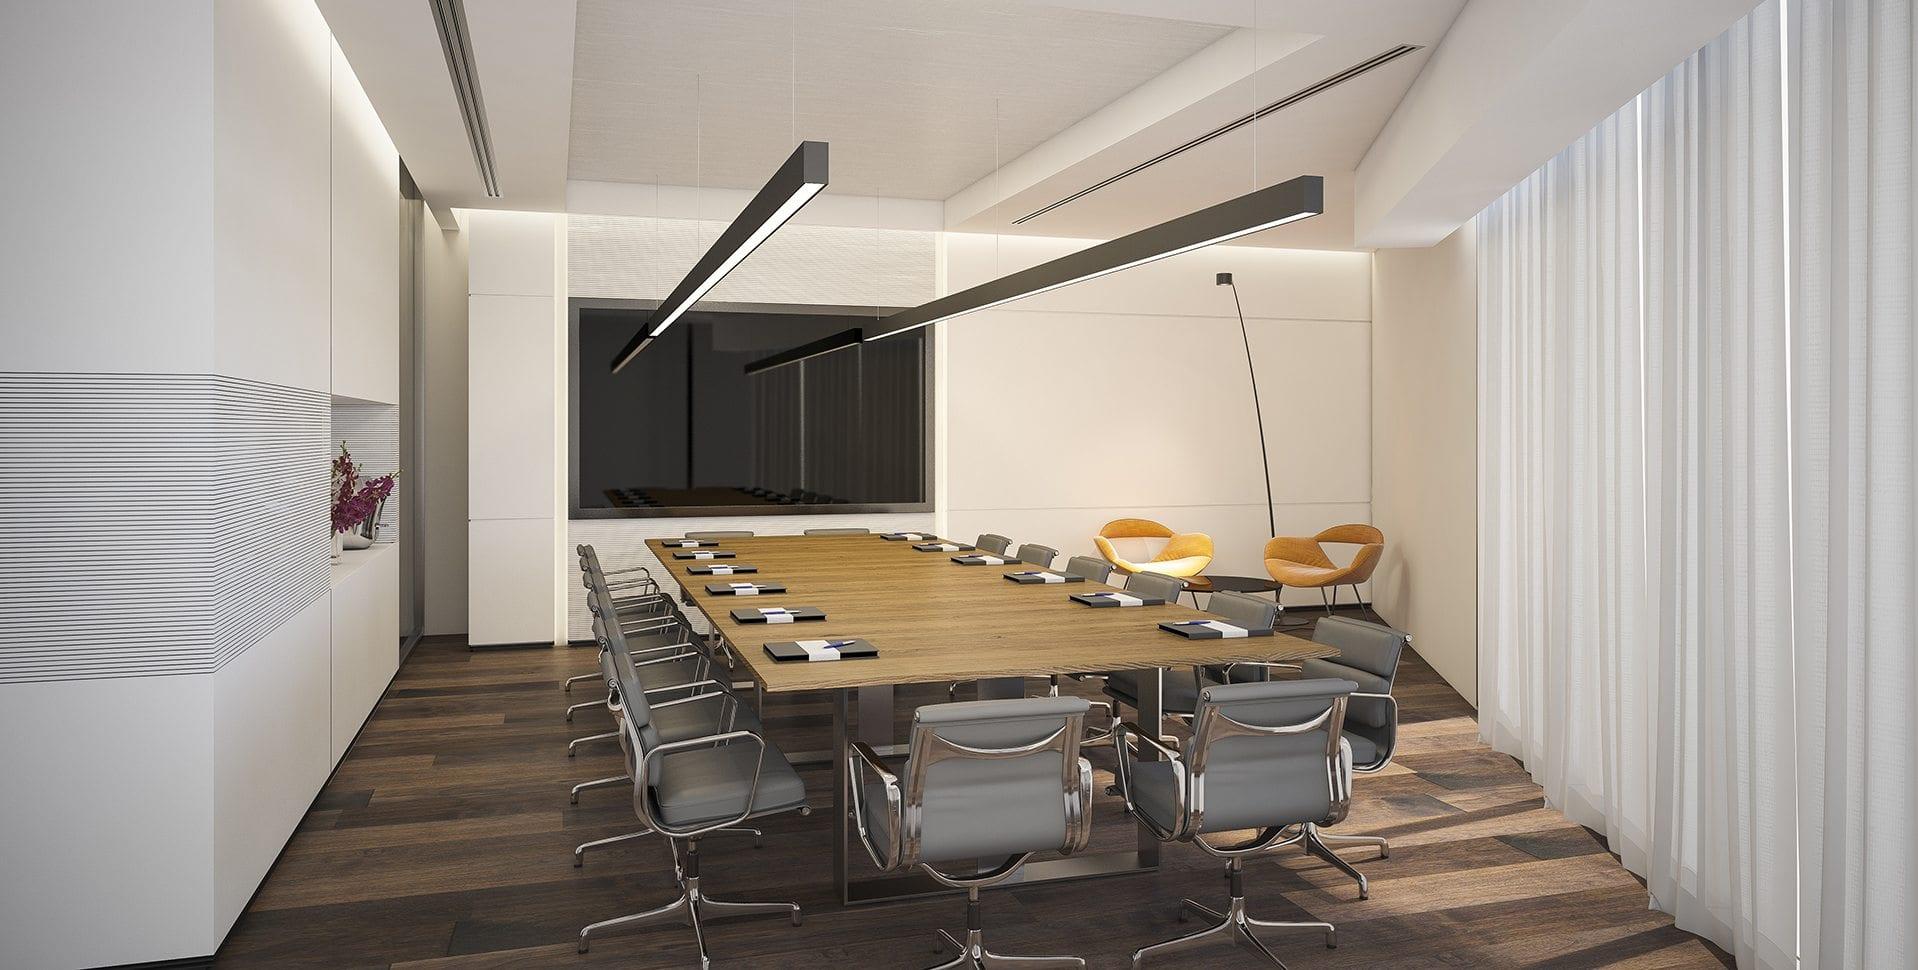 Maayan-Golan_Architectural-Visualization_ bdsk-office-visualization_offices_design-dunski-architects_03